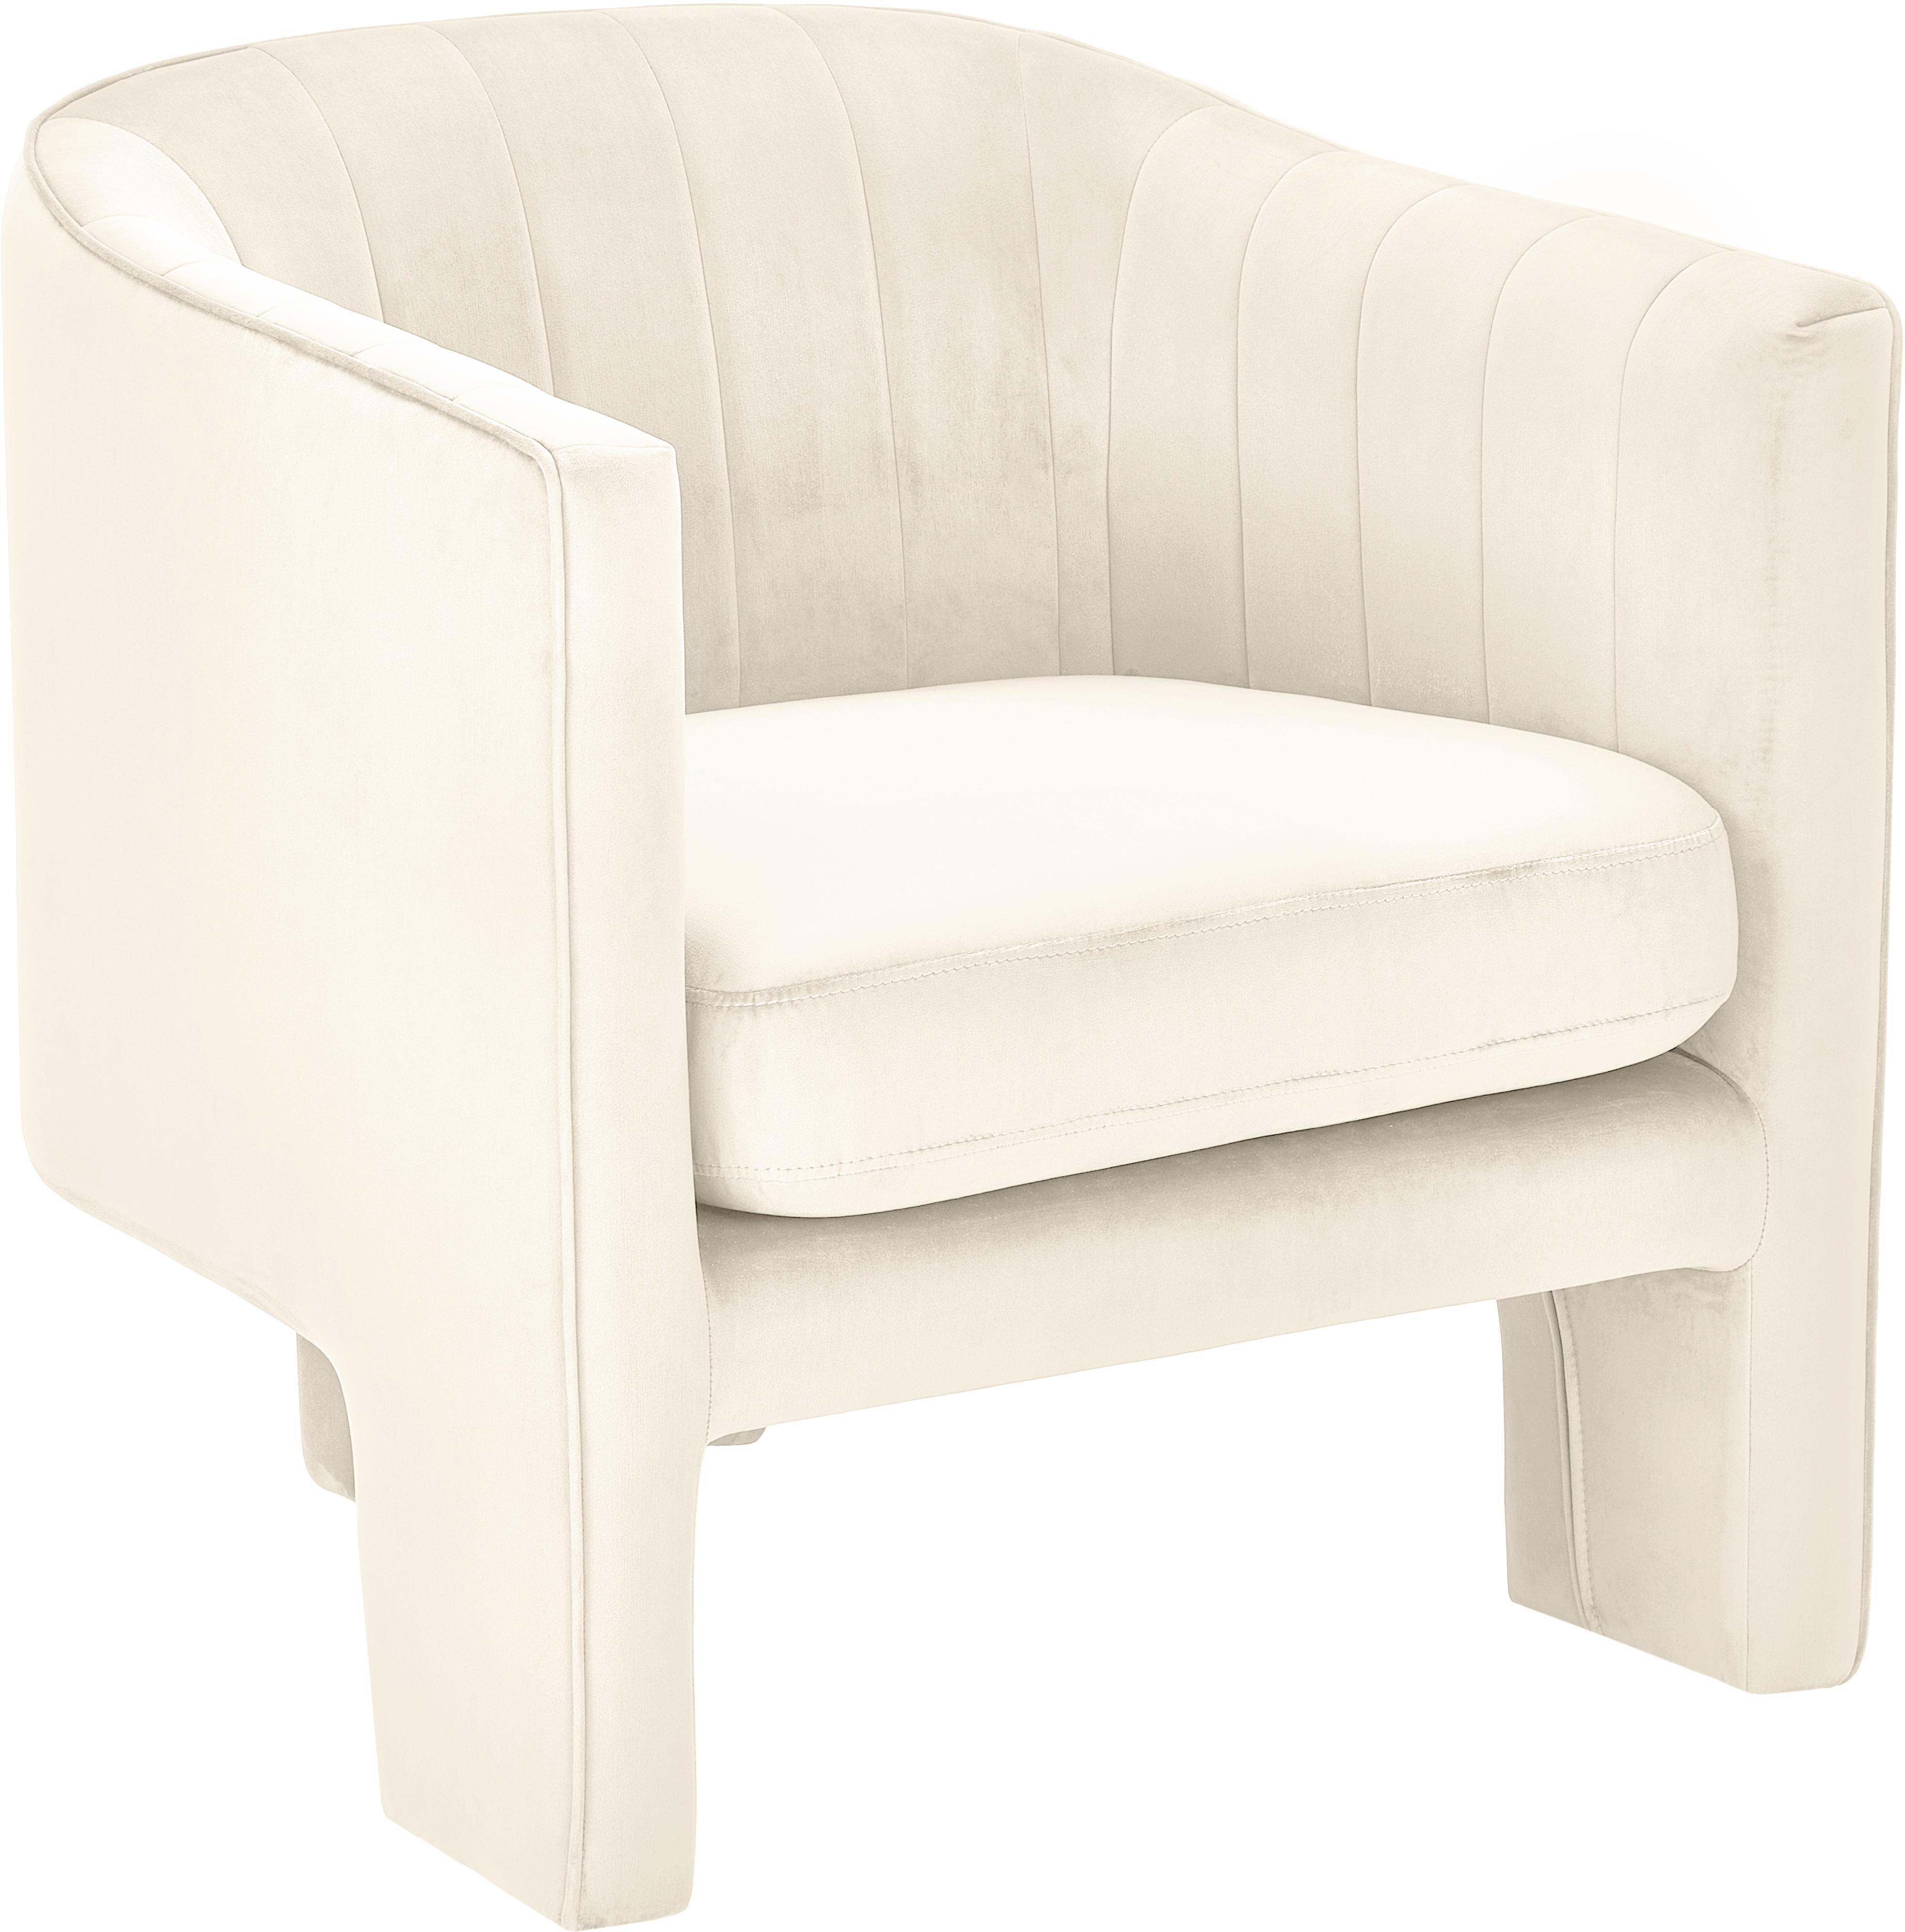 Fluwelen fauteuil Emilie, Bekleding: fluweel (polyester), Beige, B 75 x D 76 cm